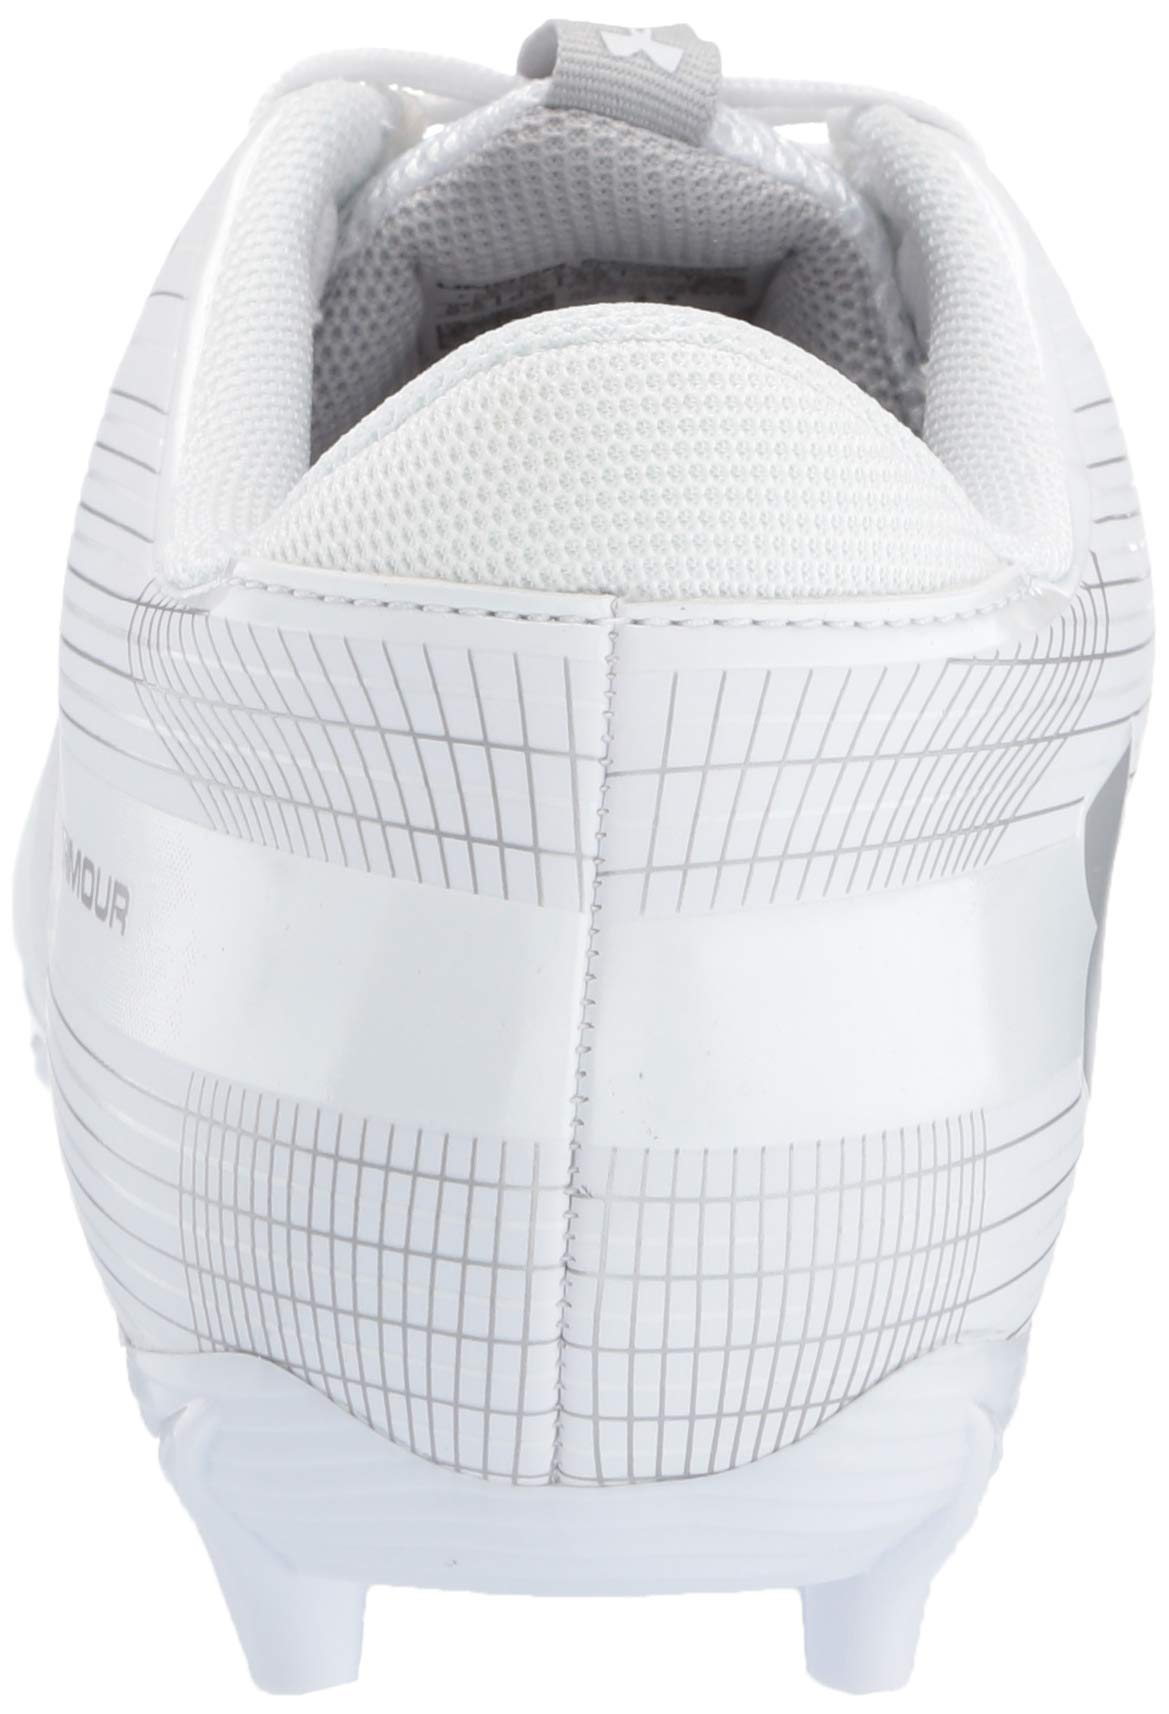 Under Armour Men's Speed Phantom MC Football Shoe, White/White, 7.5 M US by Under Armour (Image #2)